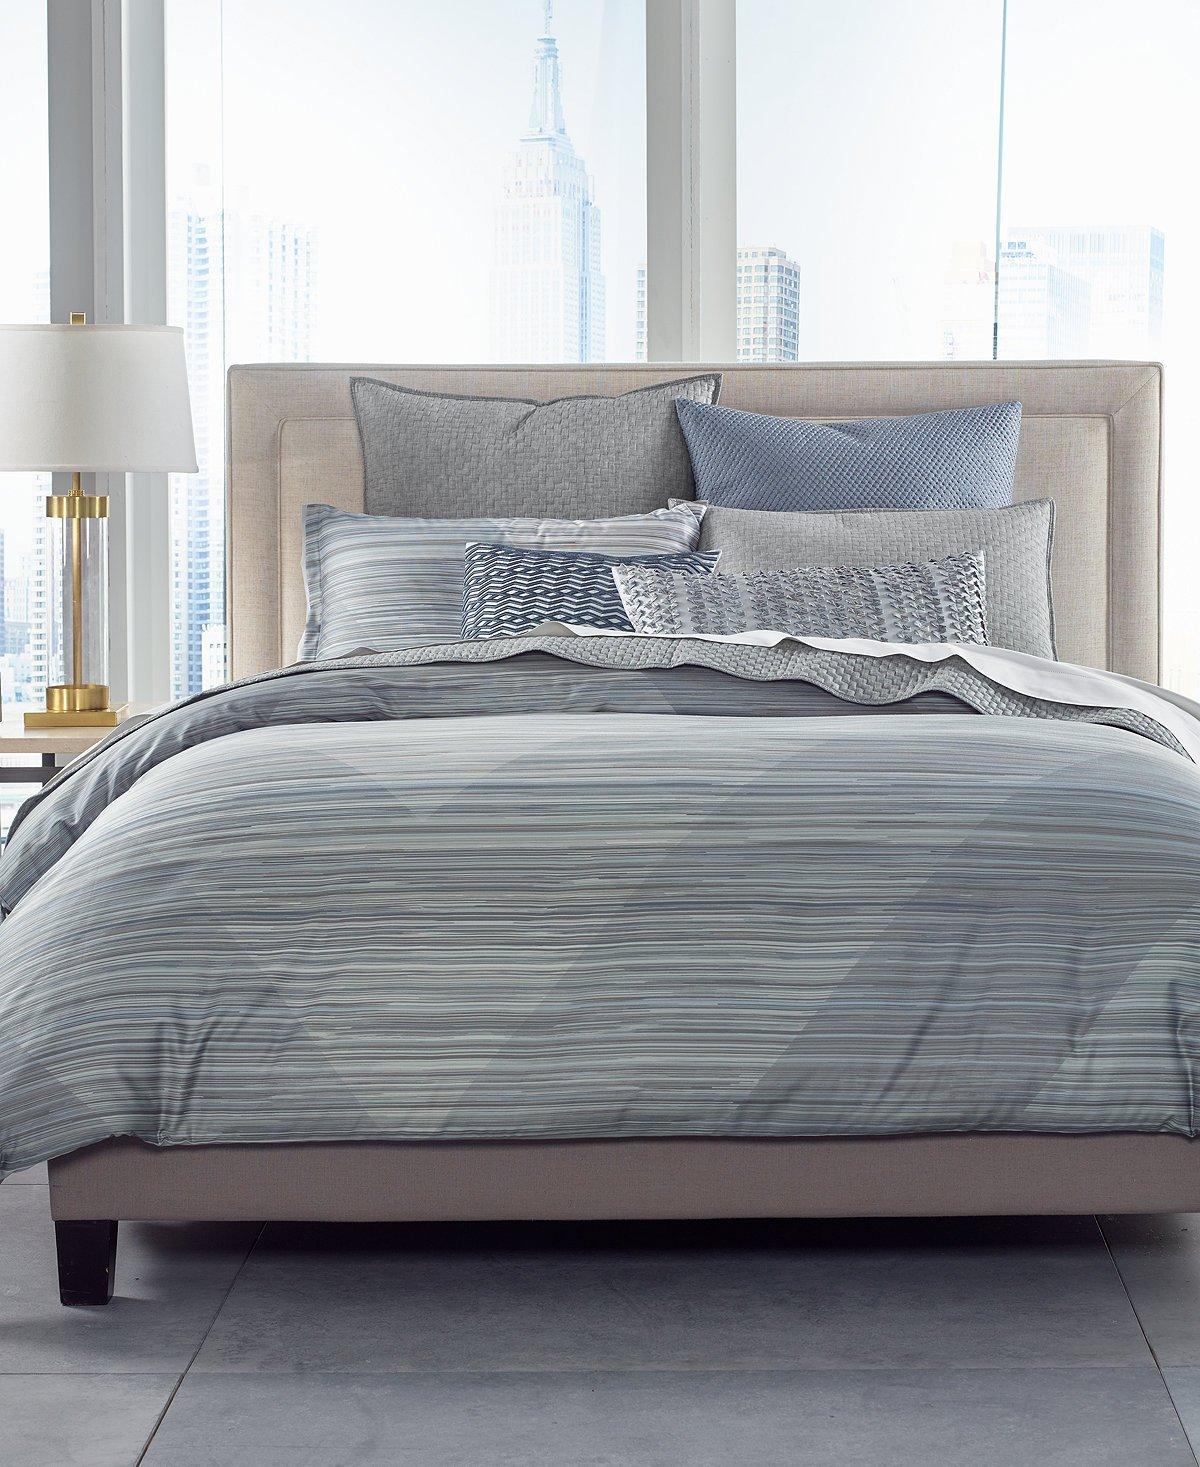 Hotel Collection Cotton Diamond Stripe Full/Queen Comforter